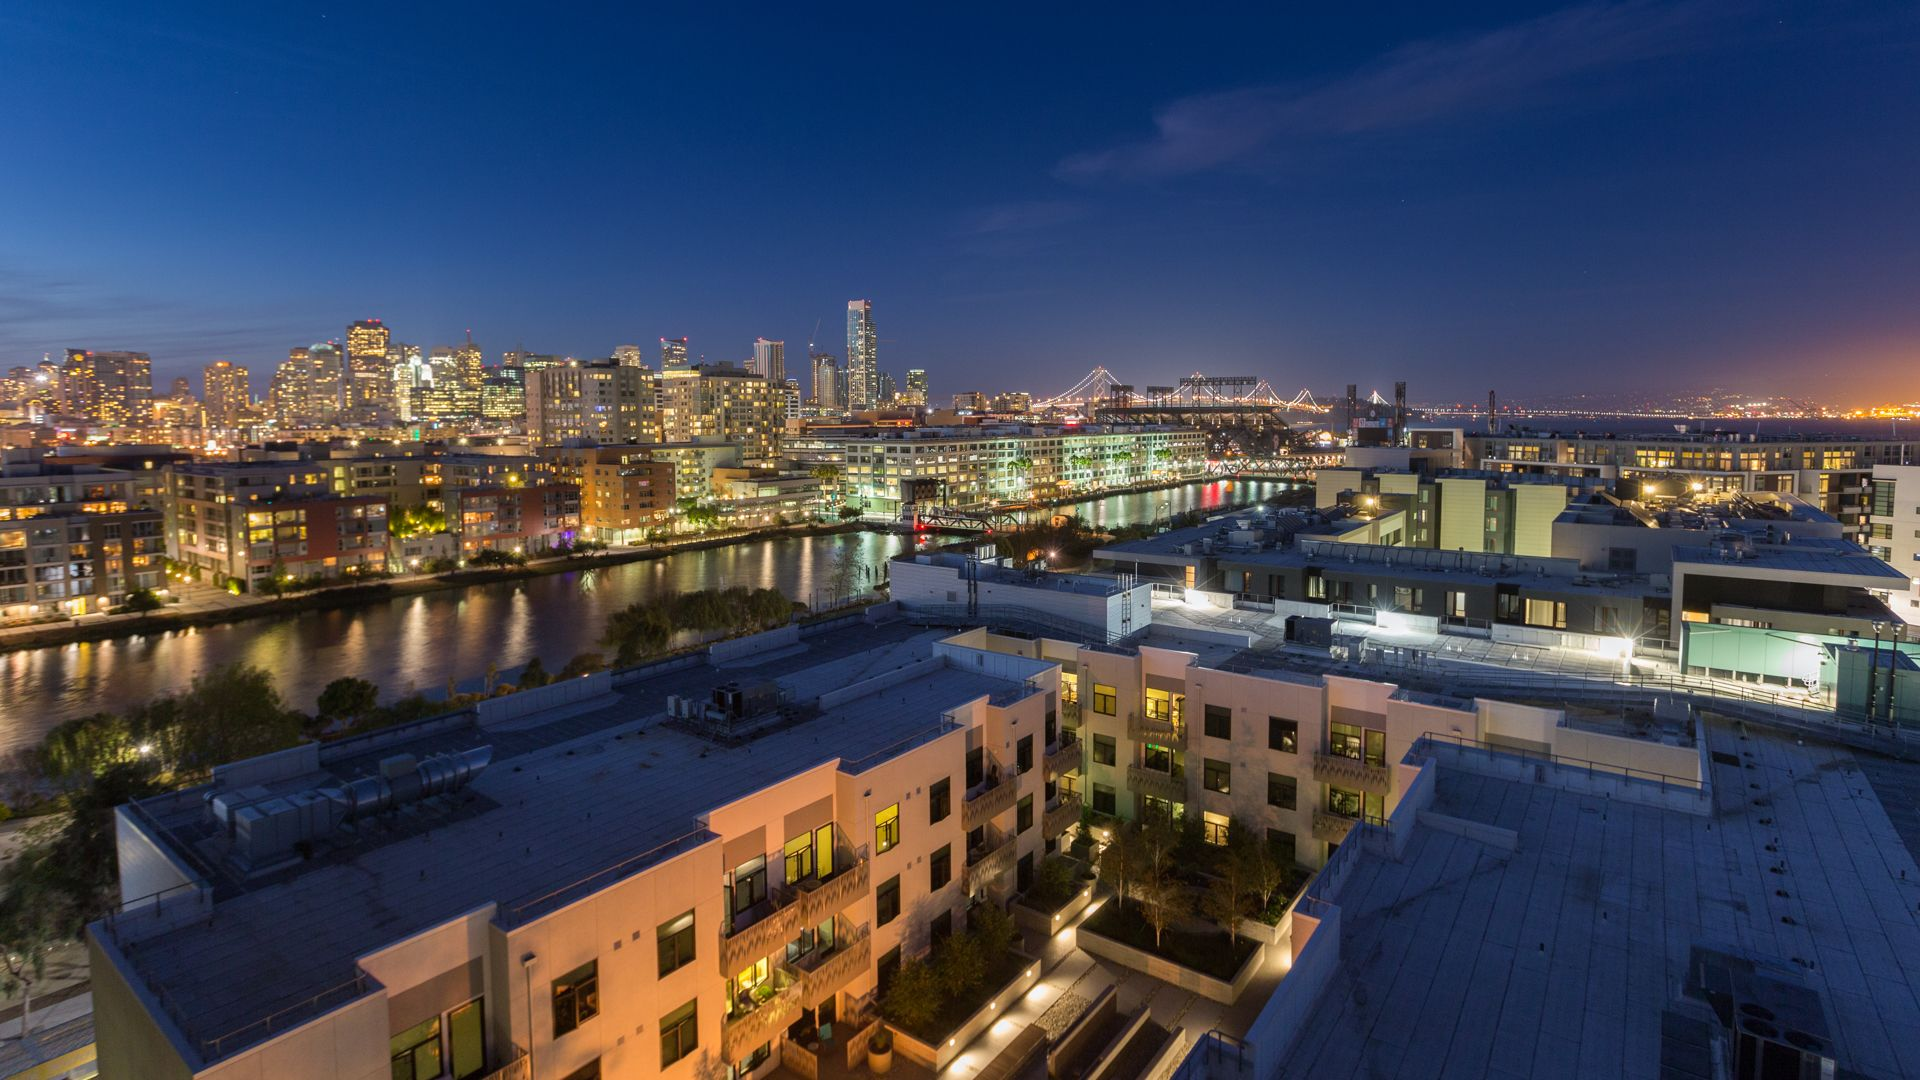 New San Francisco Luxury Apartment on Nema Apartments San Francisco